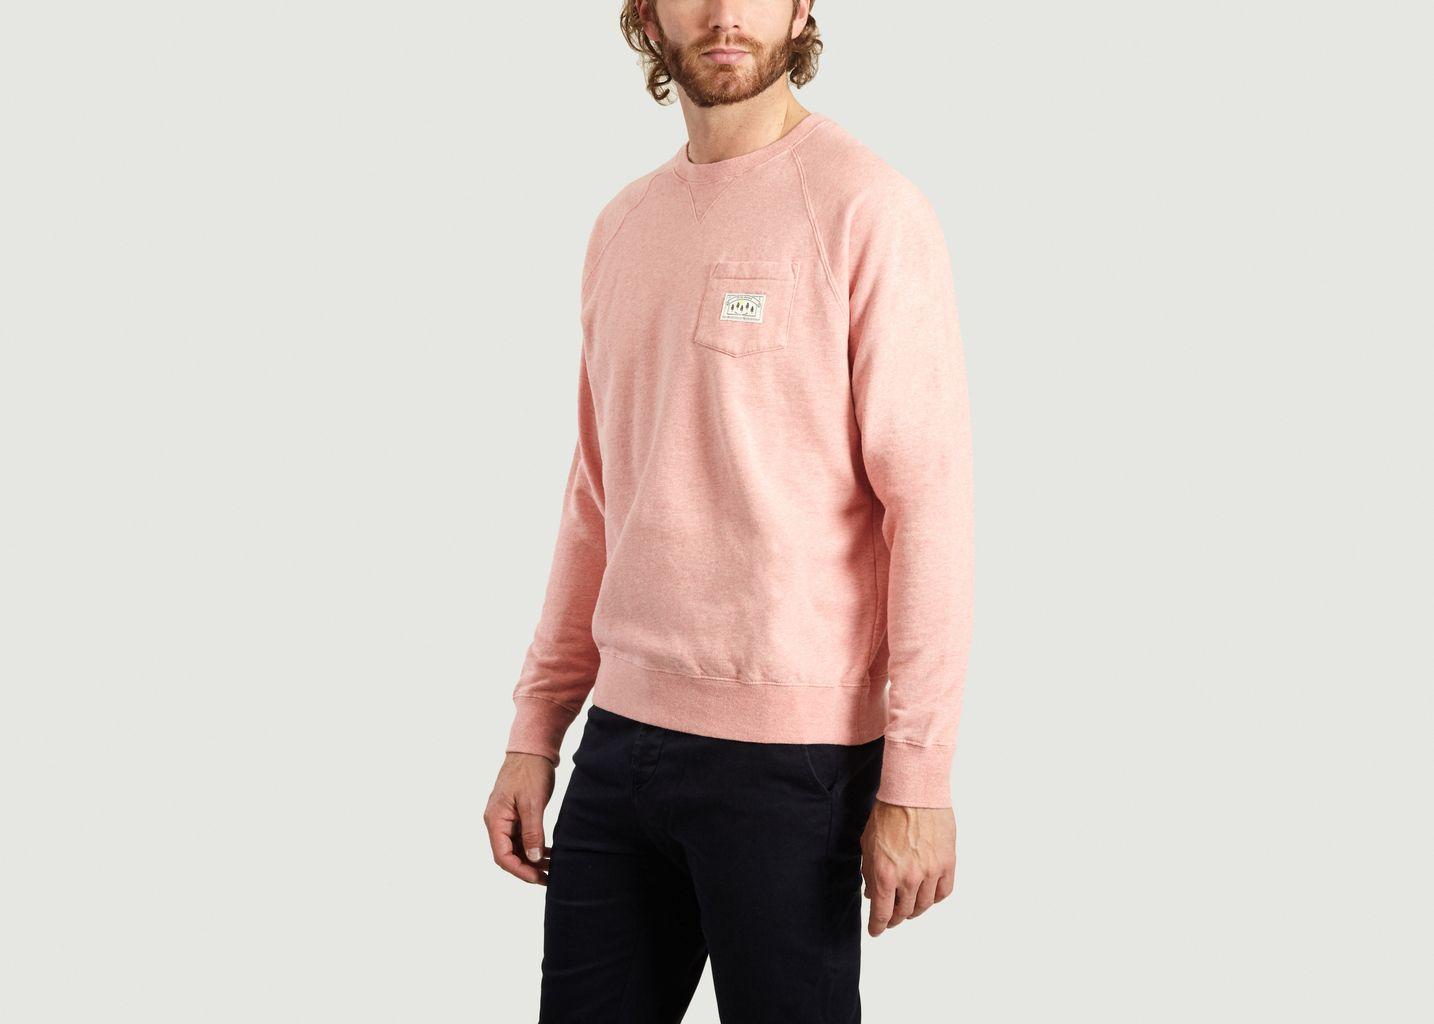 Sweatshirt Poche Label - Cuisse de Grenouille